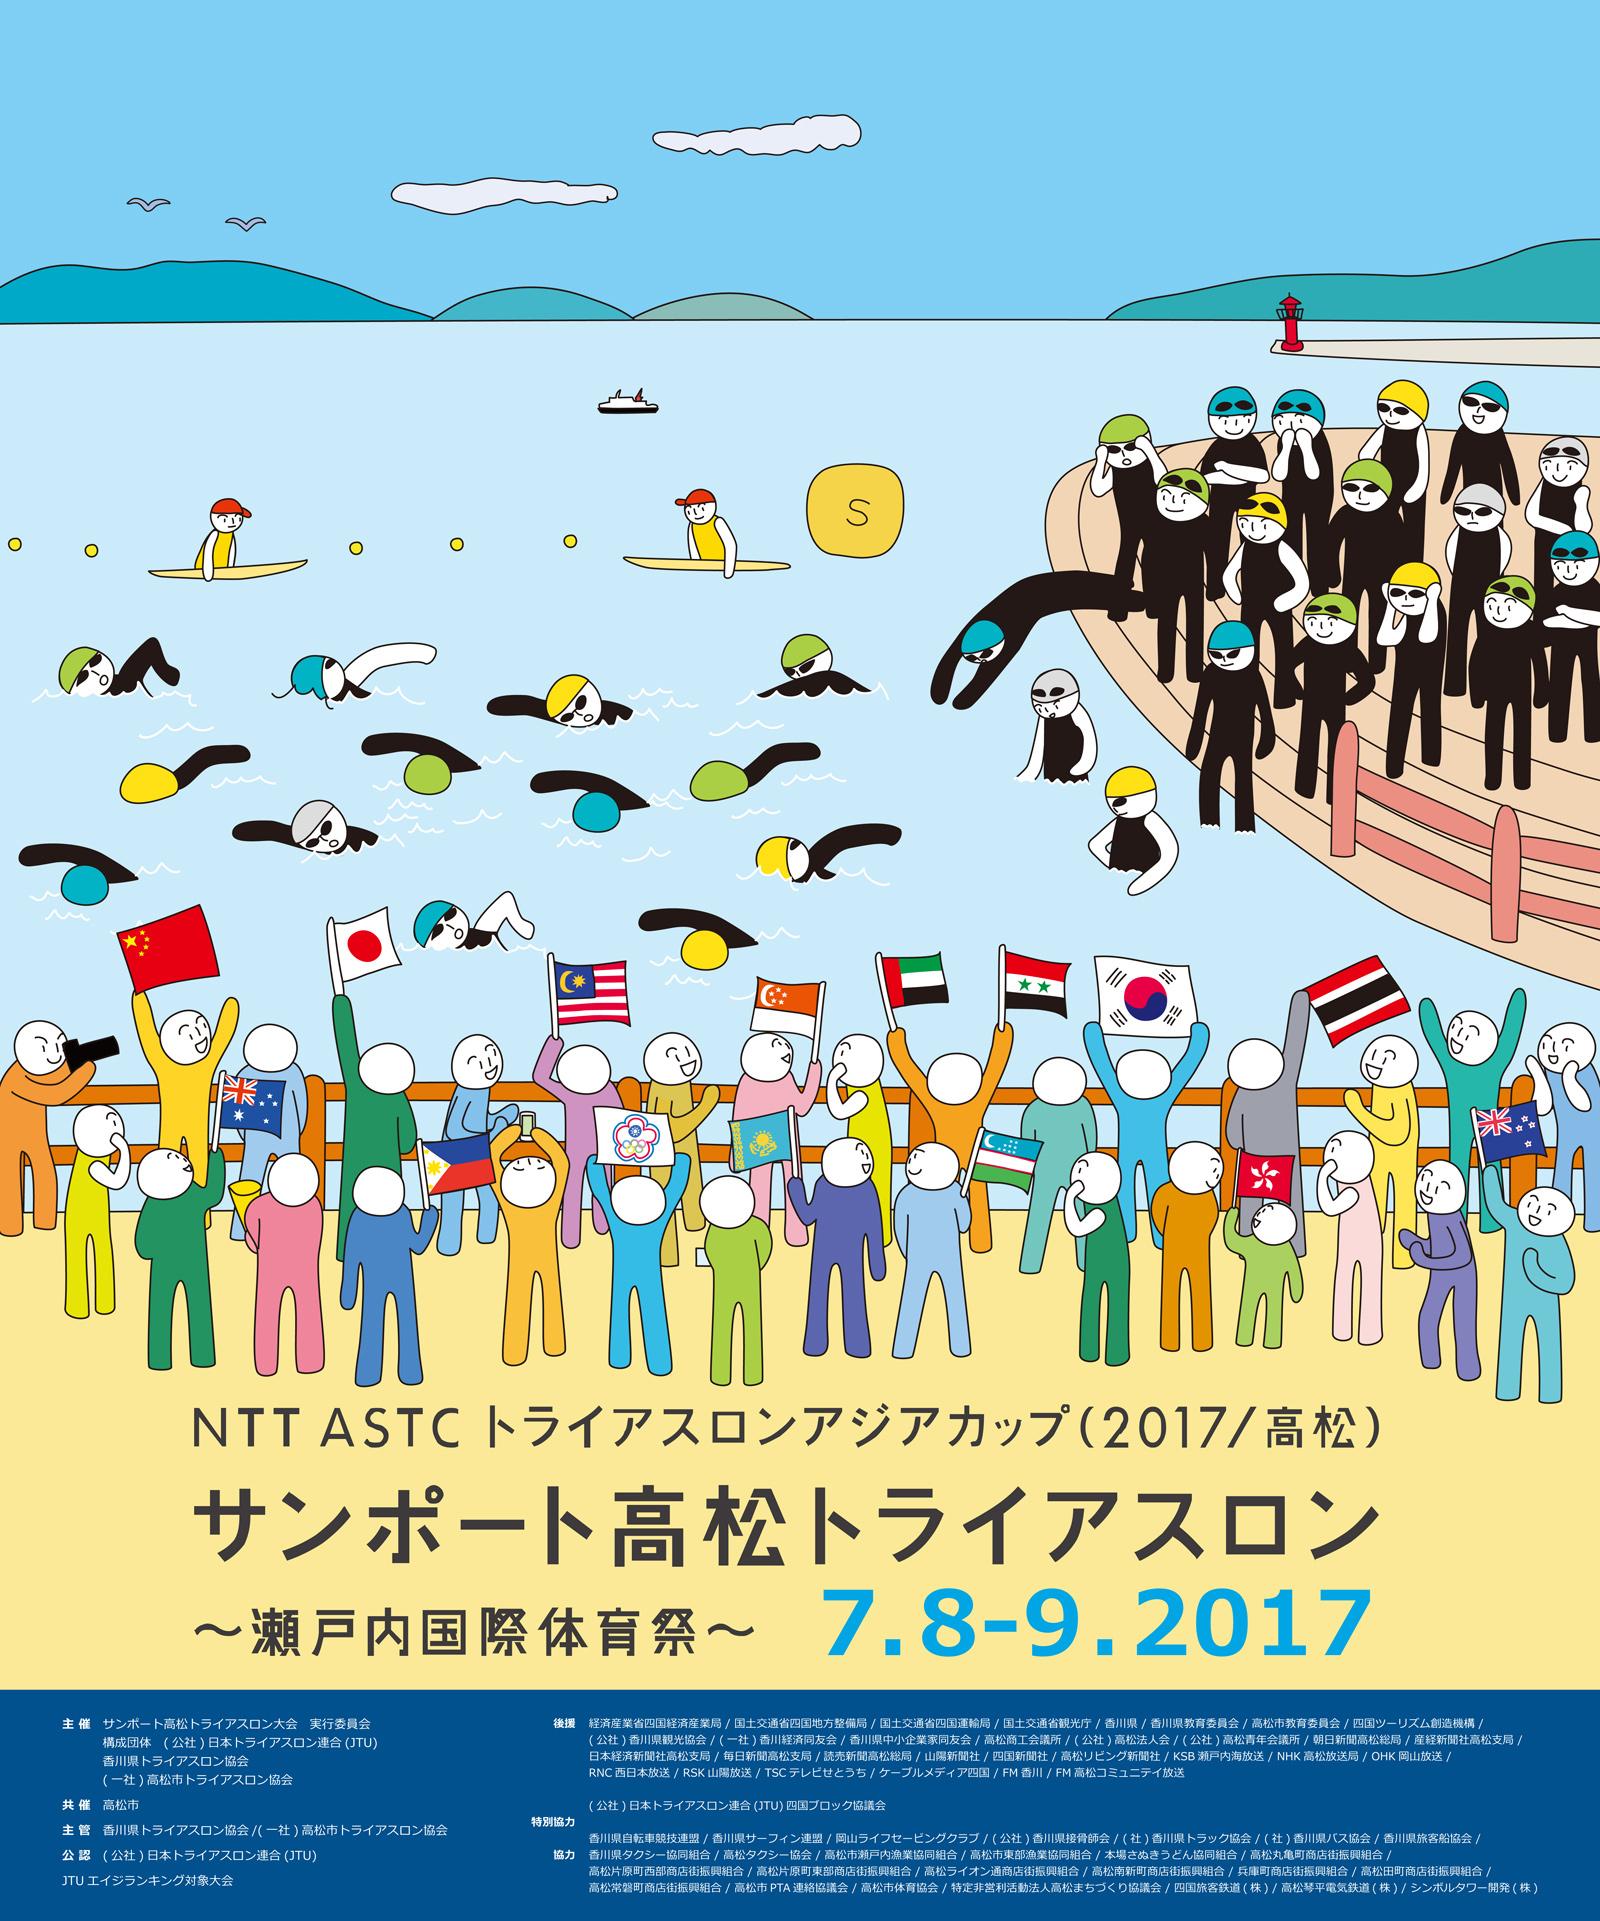 takamatsu_poster_2017_1600